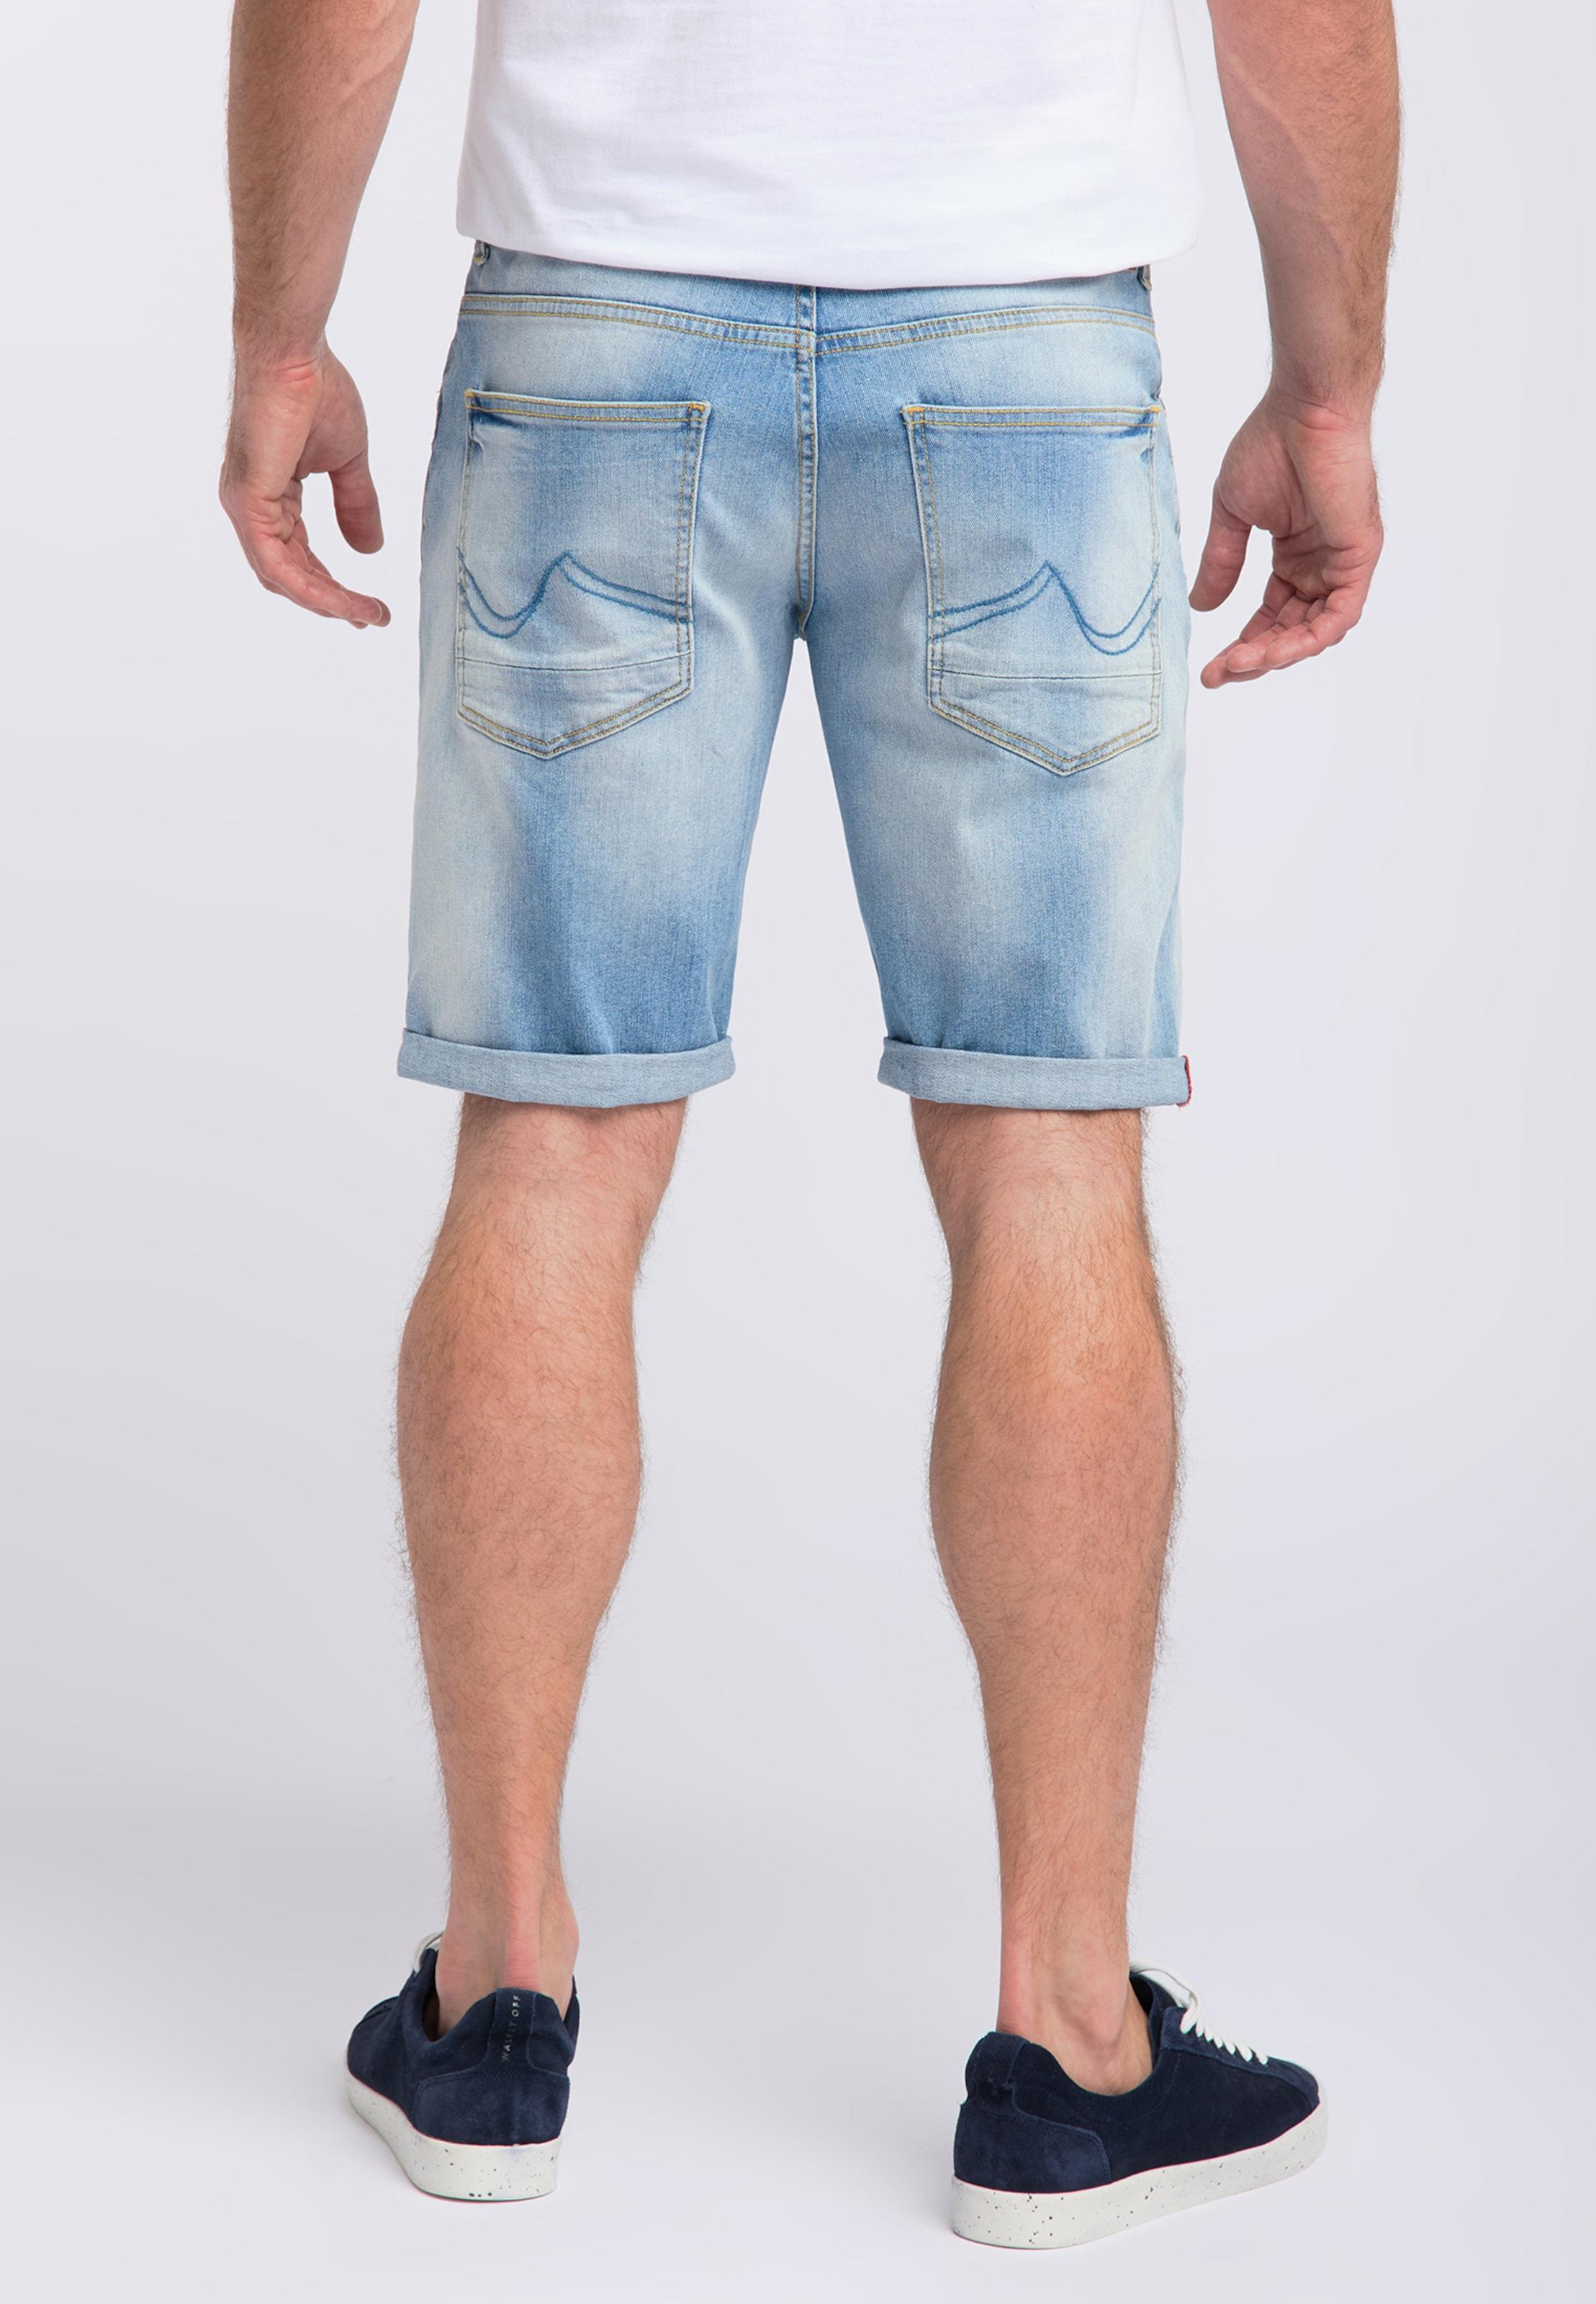 Shorts In DenimHellblau Petrol Industries Blue 13uJlcTFK